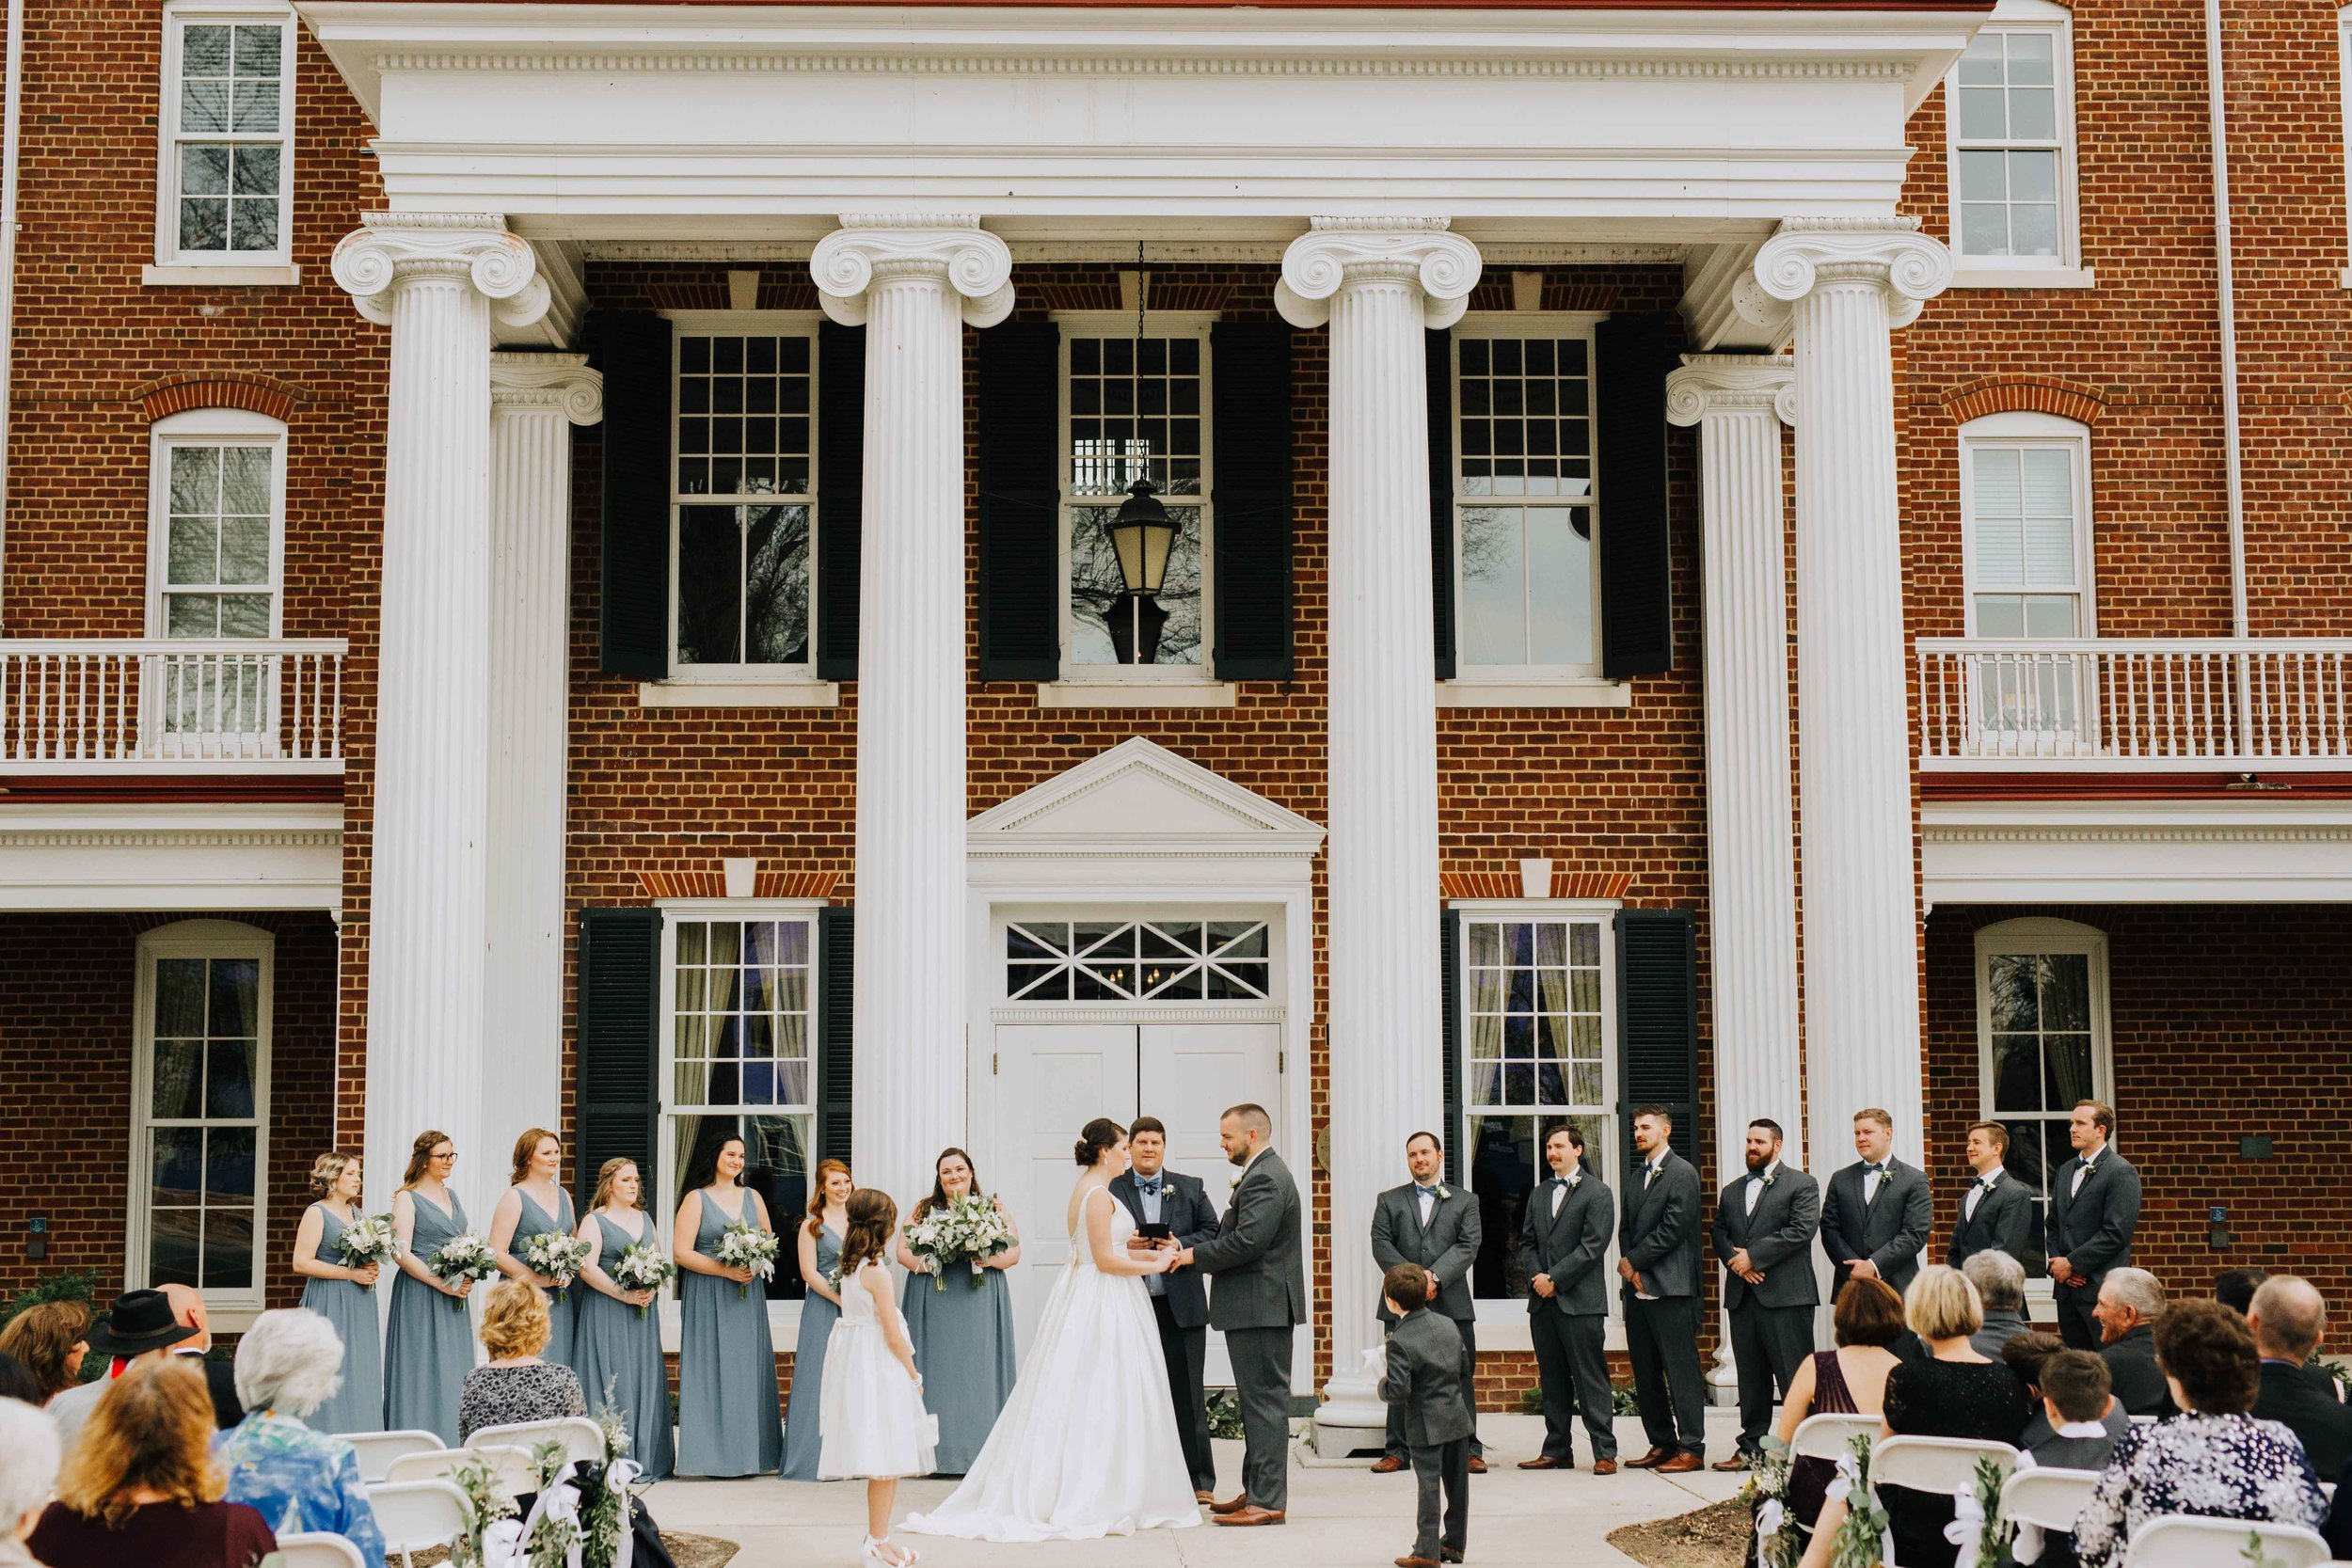 Farmville-Virginia-Wedding-Hotel-Weynoke-Downtown-Jacqueline-Waters-Photography-Detailed- (829).jpg